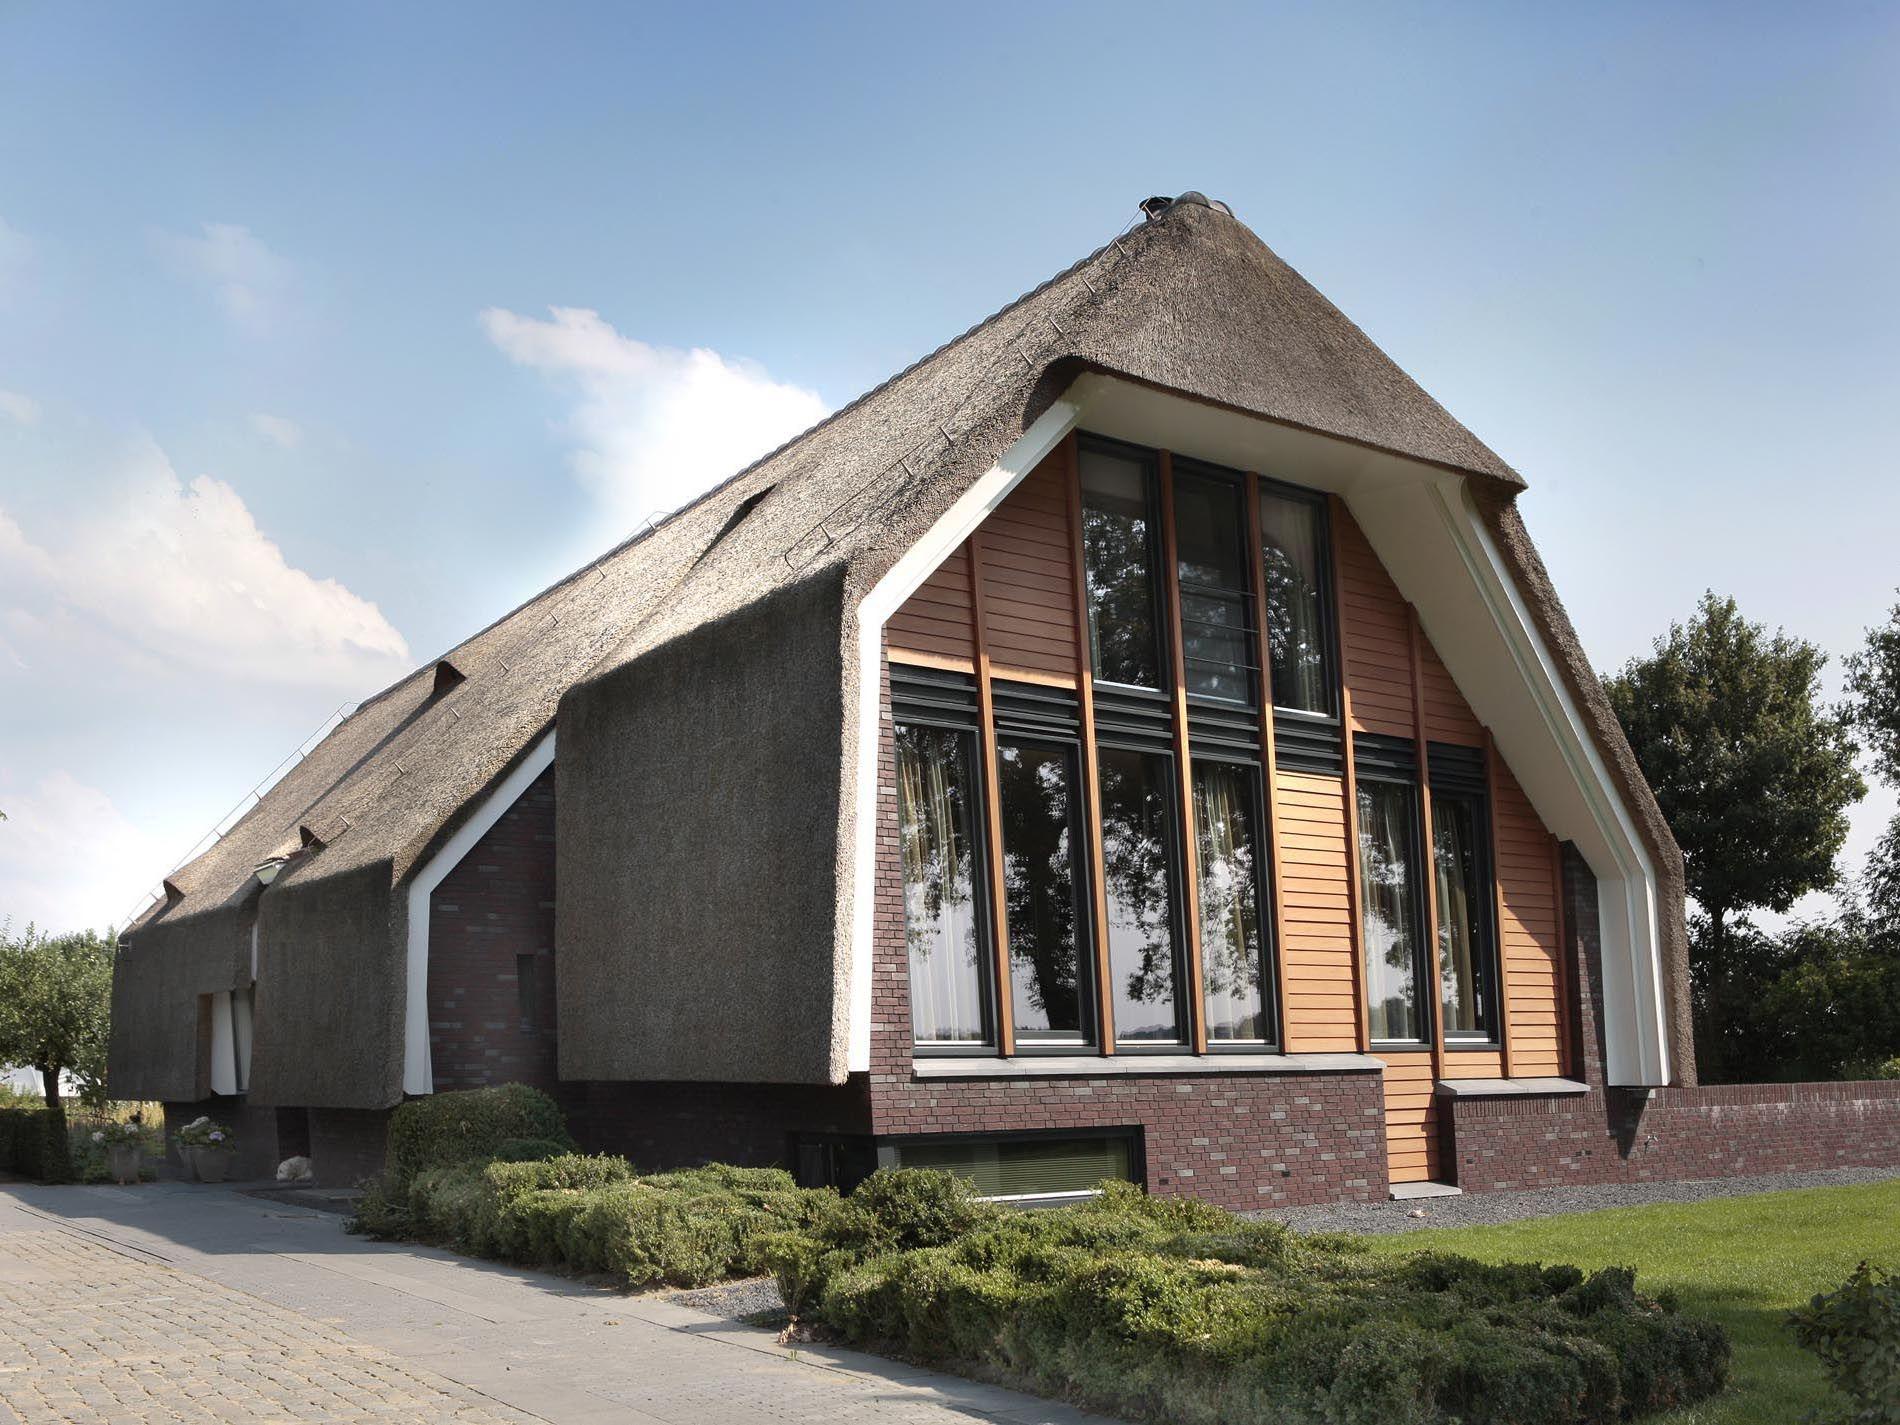 Rieten Dak Woning Modern House Thatched Roof Huis